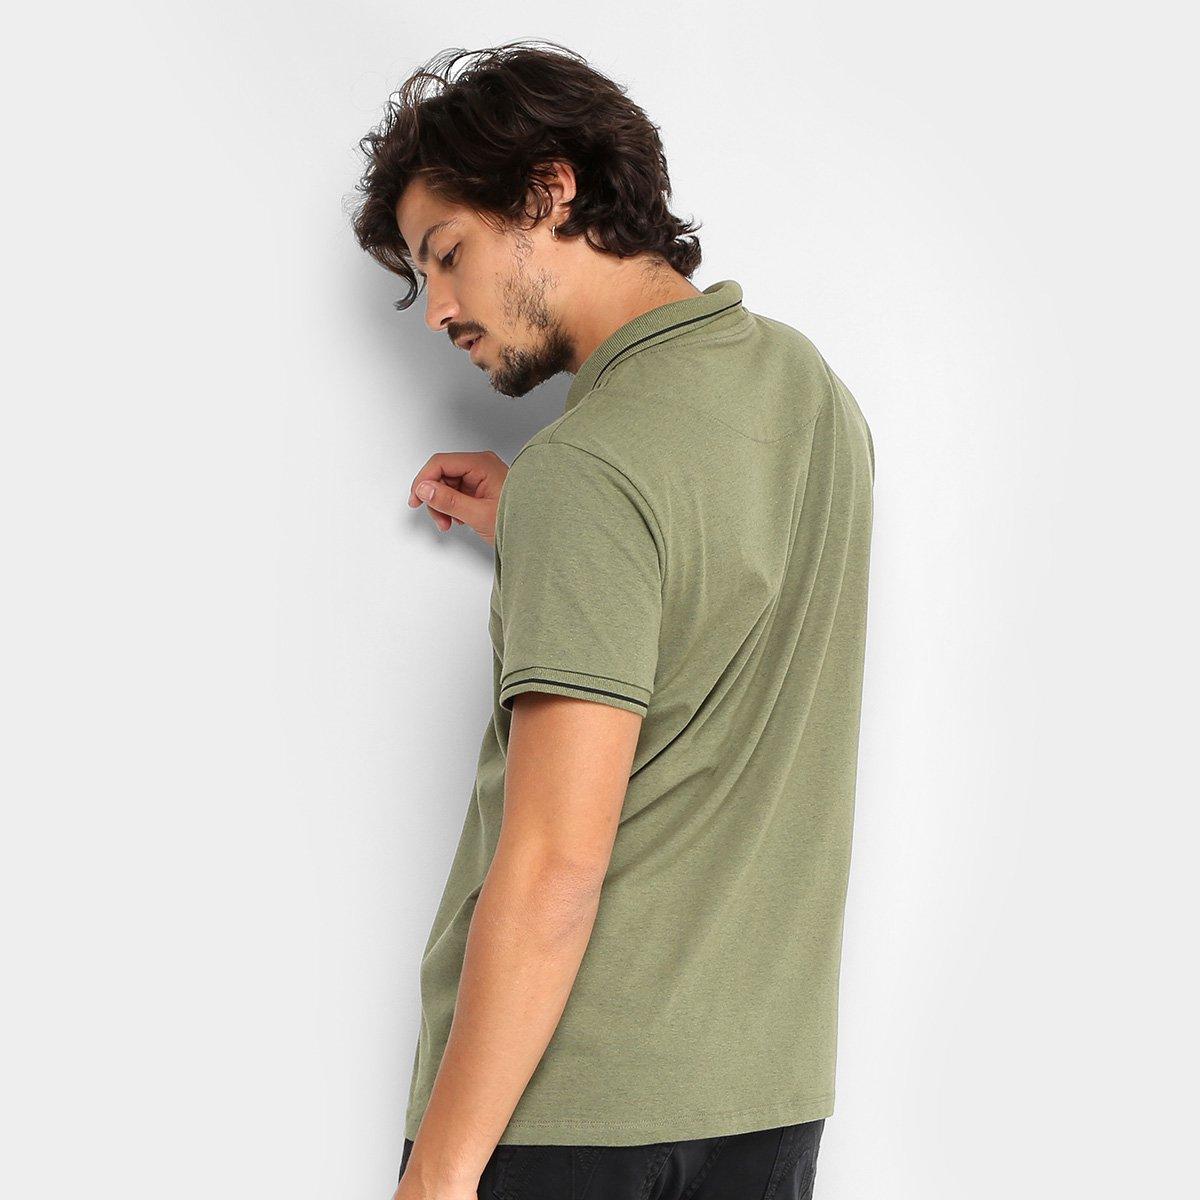 Camisa Polo Reserva Malha Masculina  Camisa Polo Reserva Malha Masculina ... 0d4fb9a30c08f